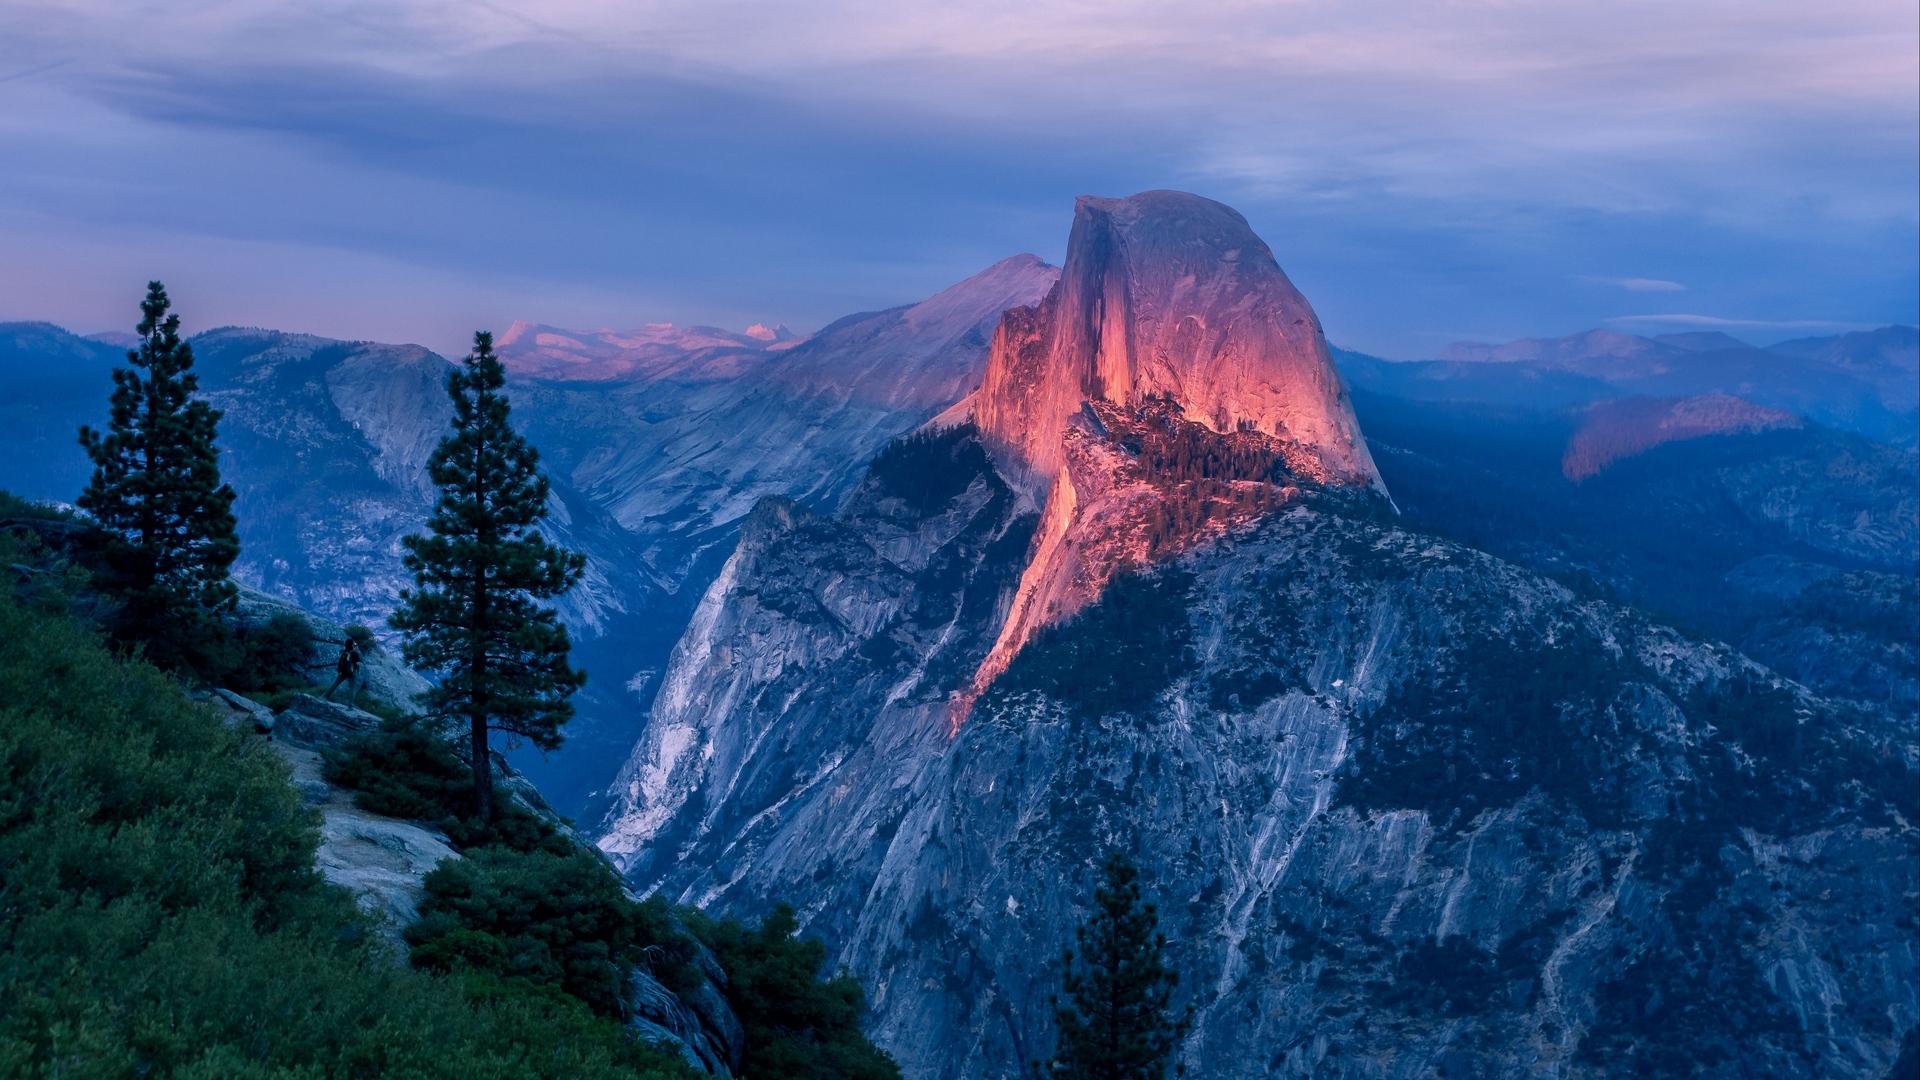 Wallpaper Mountains Peak Sky Yosemite Valley Usa